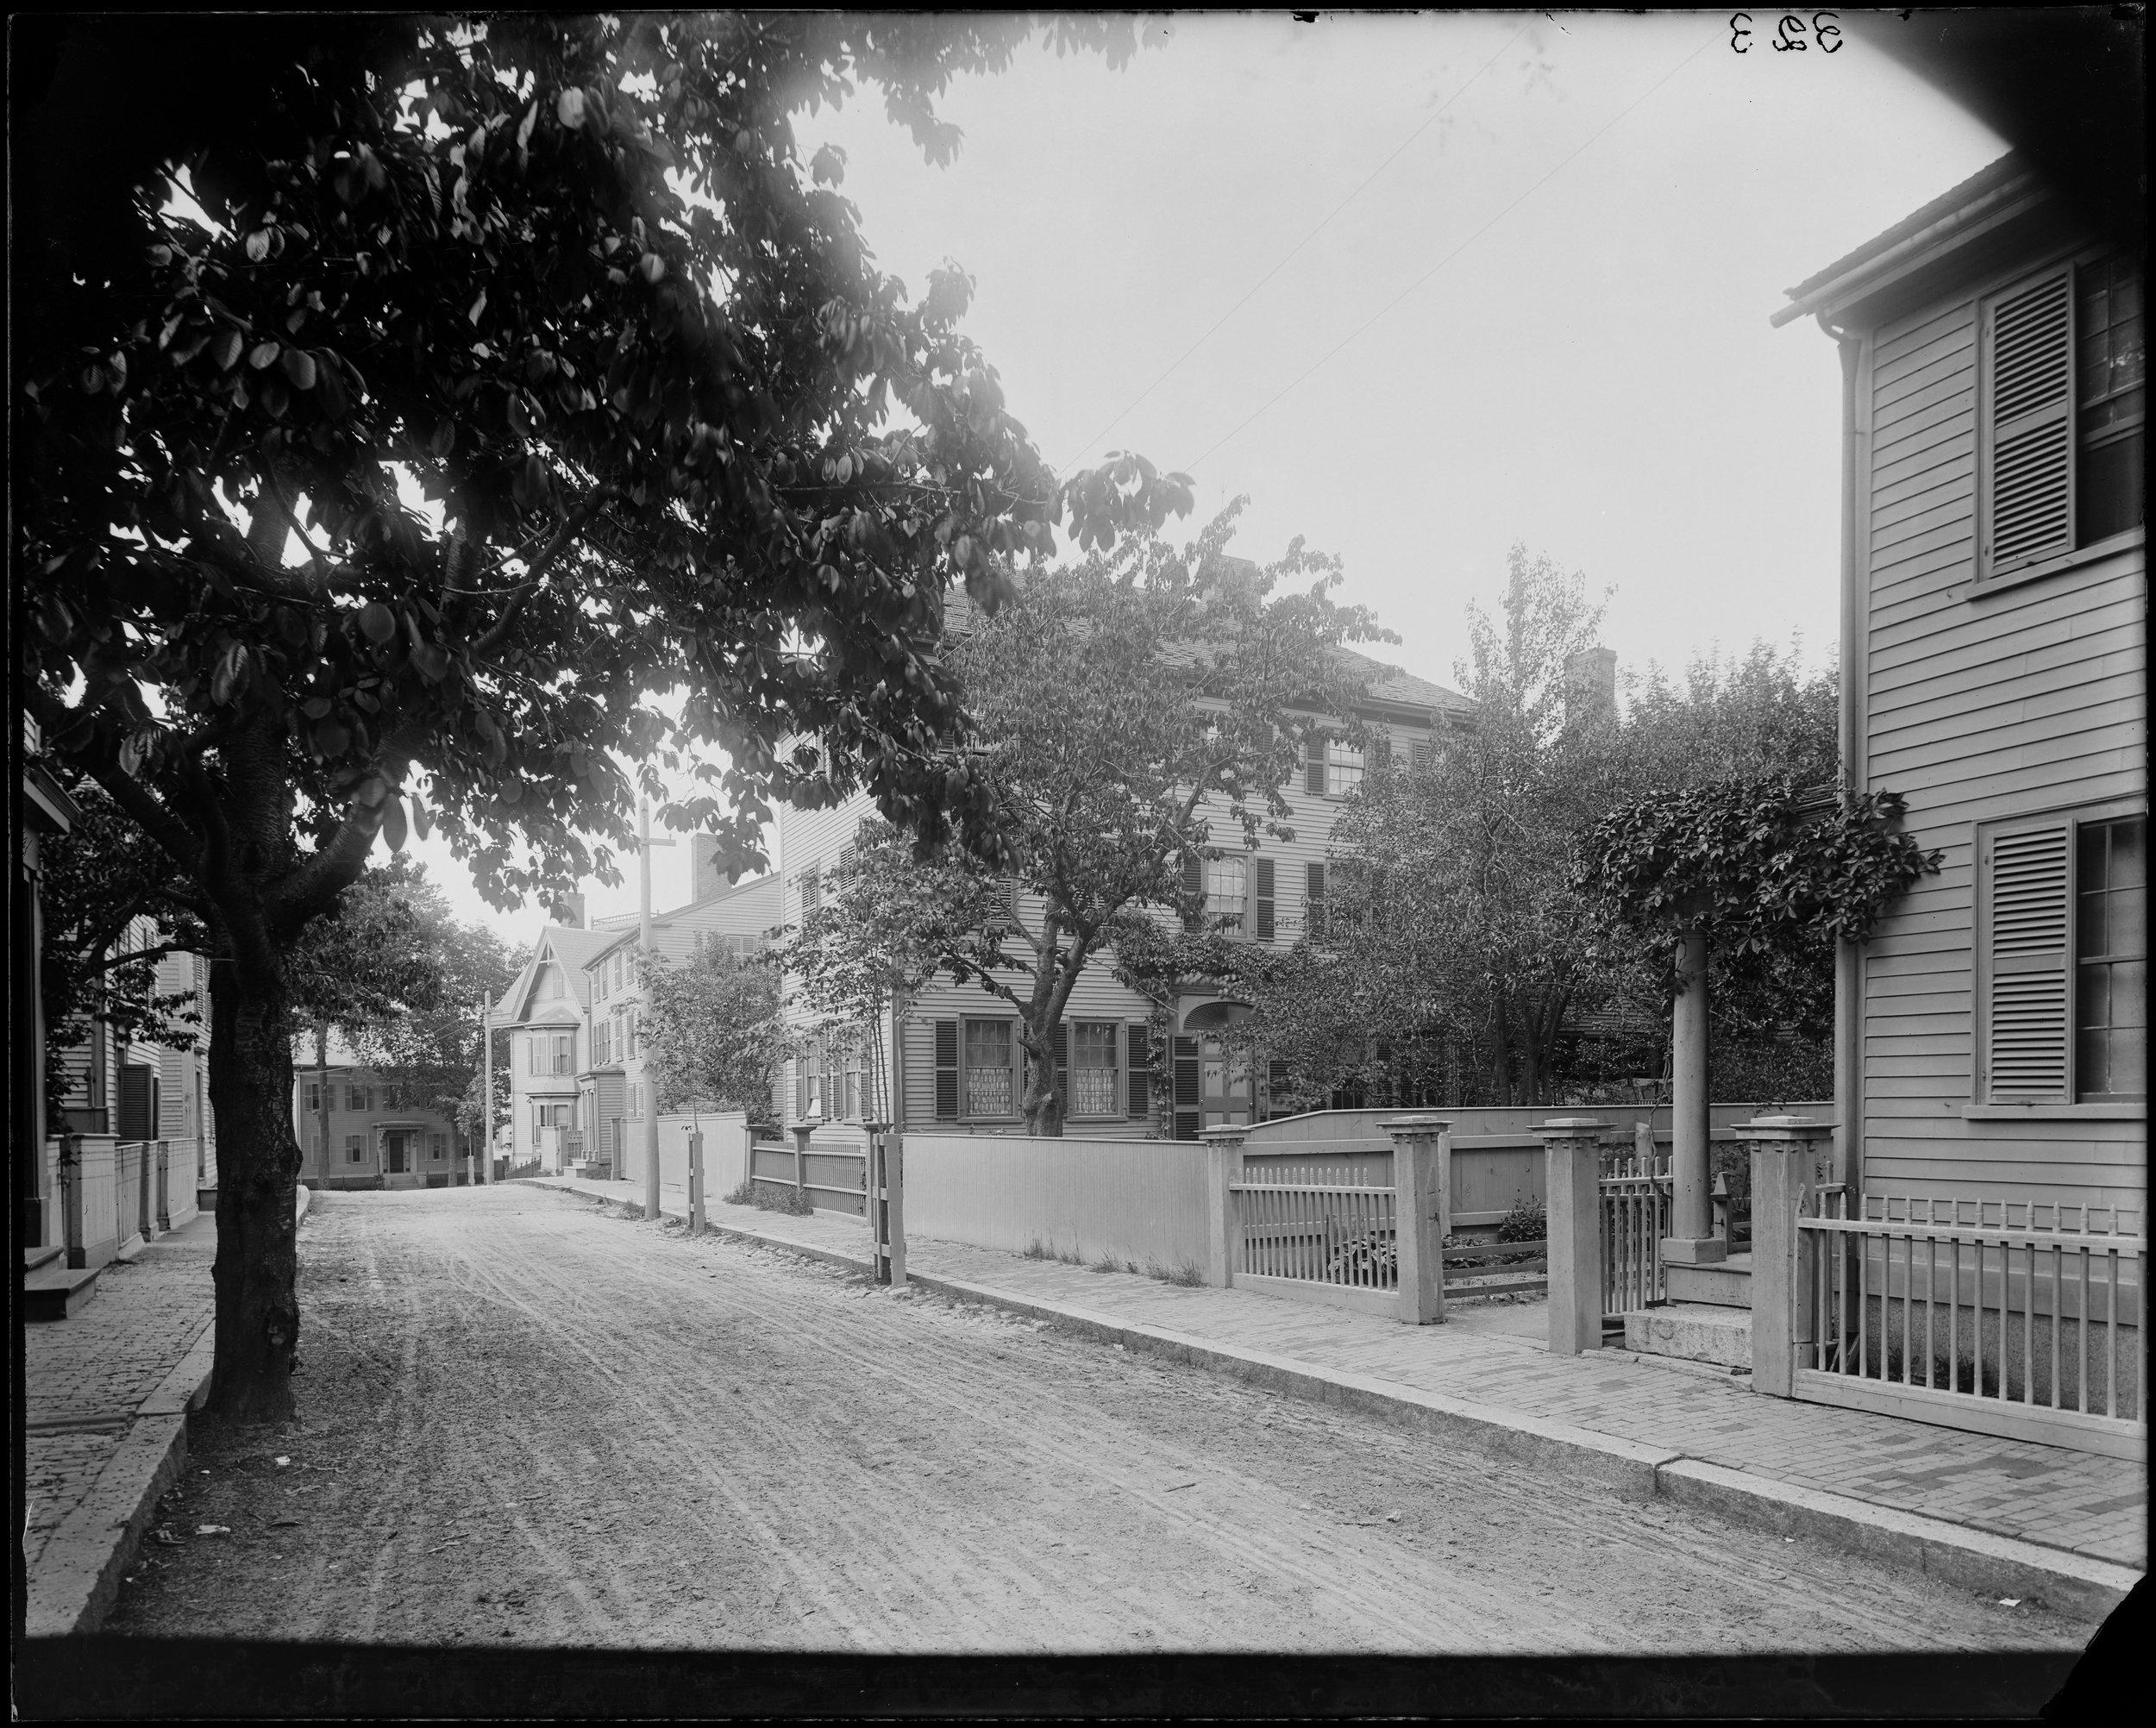 """Salem, 14 Mall Street, Hawthorne house where ""Scarlet Letter"" was written"""